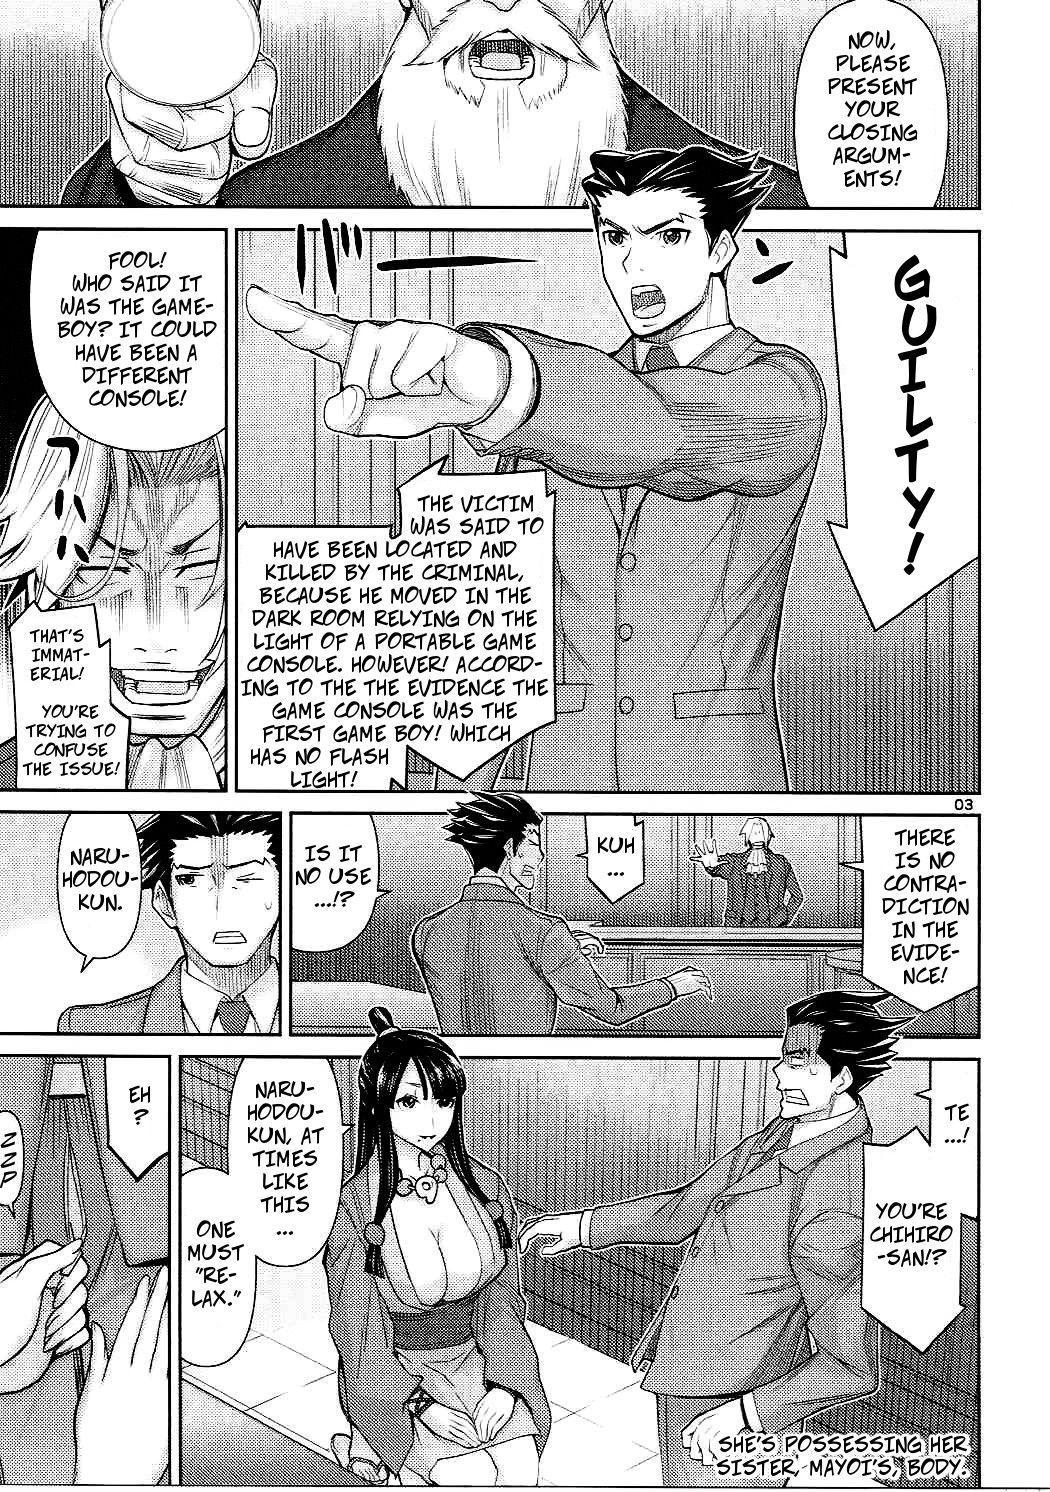 (C90) [Low Thrust (Tsunagami)] Igi nashi -- No Objection (Ace Attorney) [English] 1